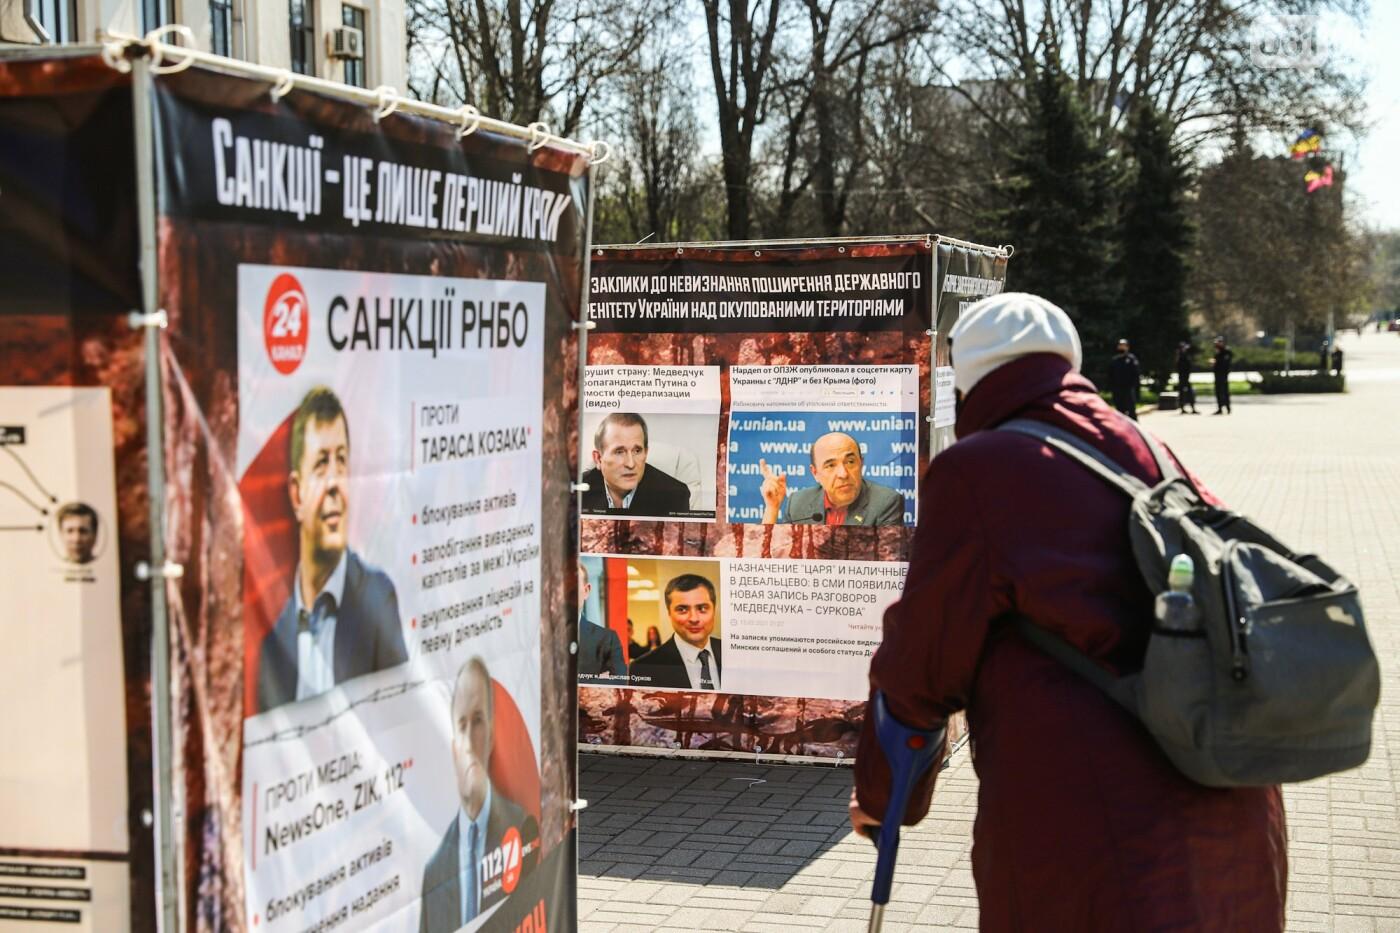 В Запорожье возле мэрии установили стенды с портретами Медведчука и Шария, - ФОТО, фото-14